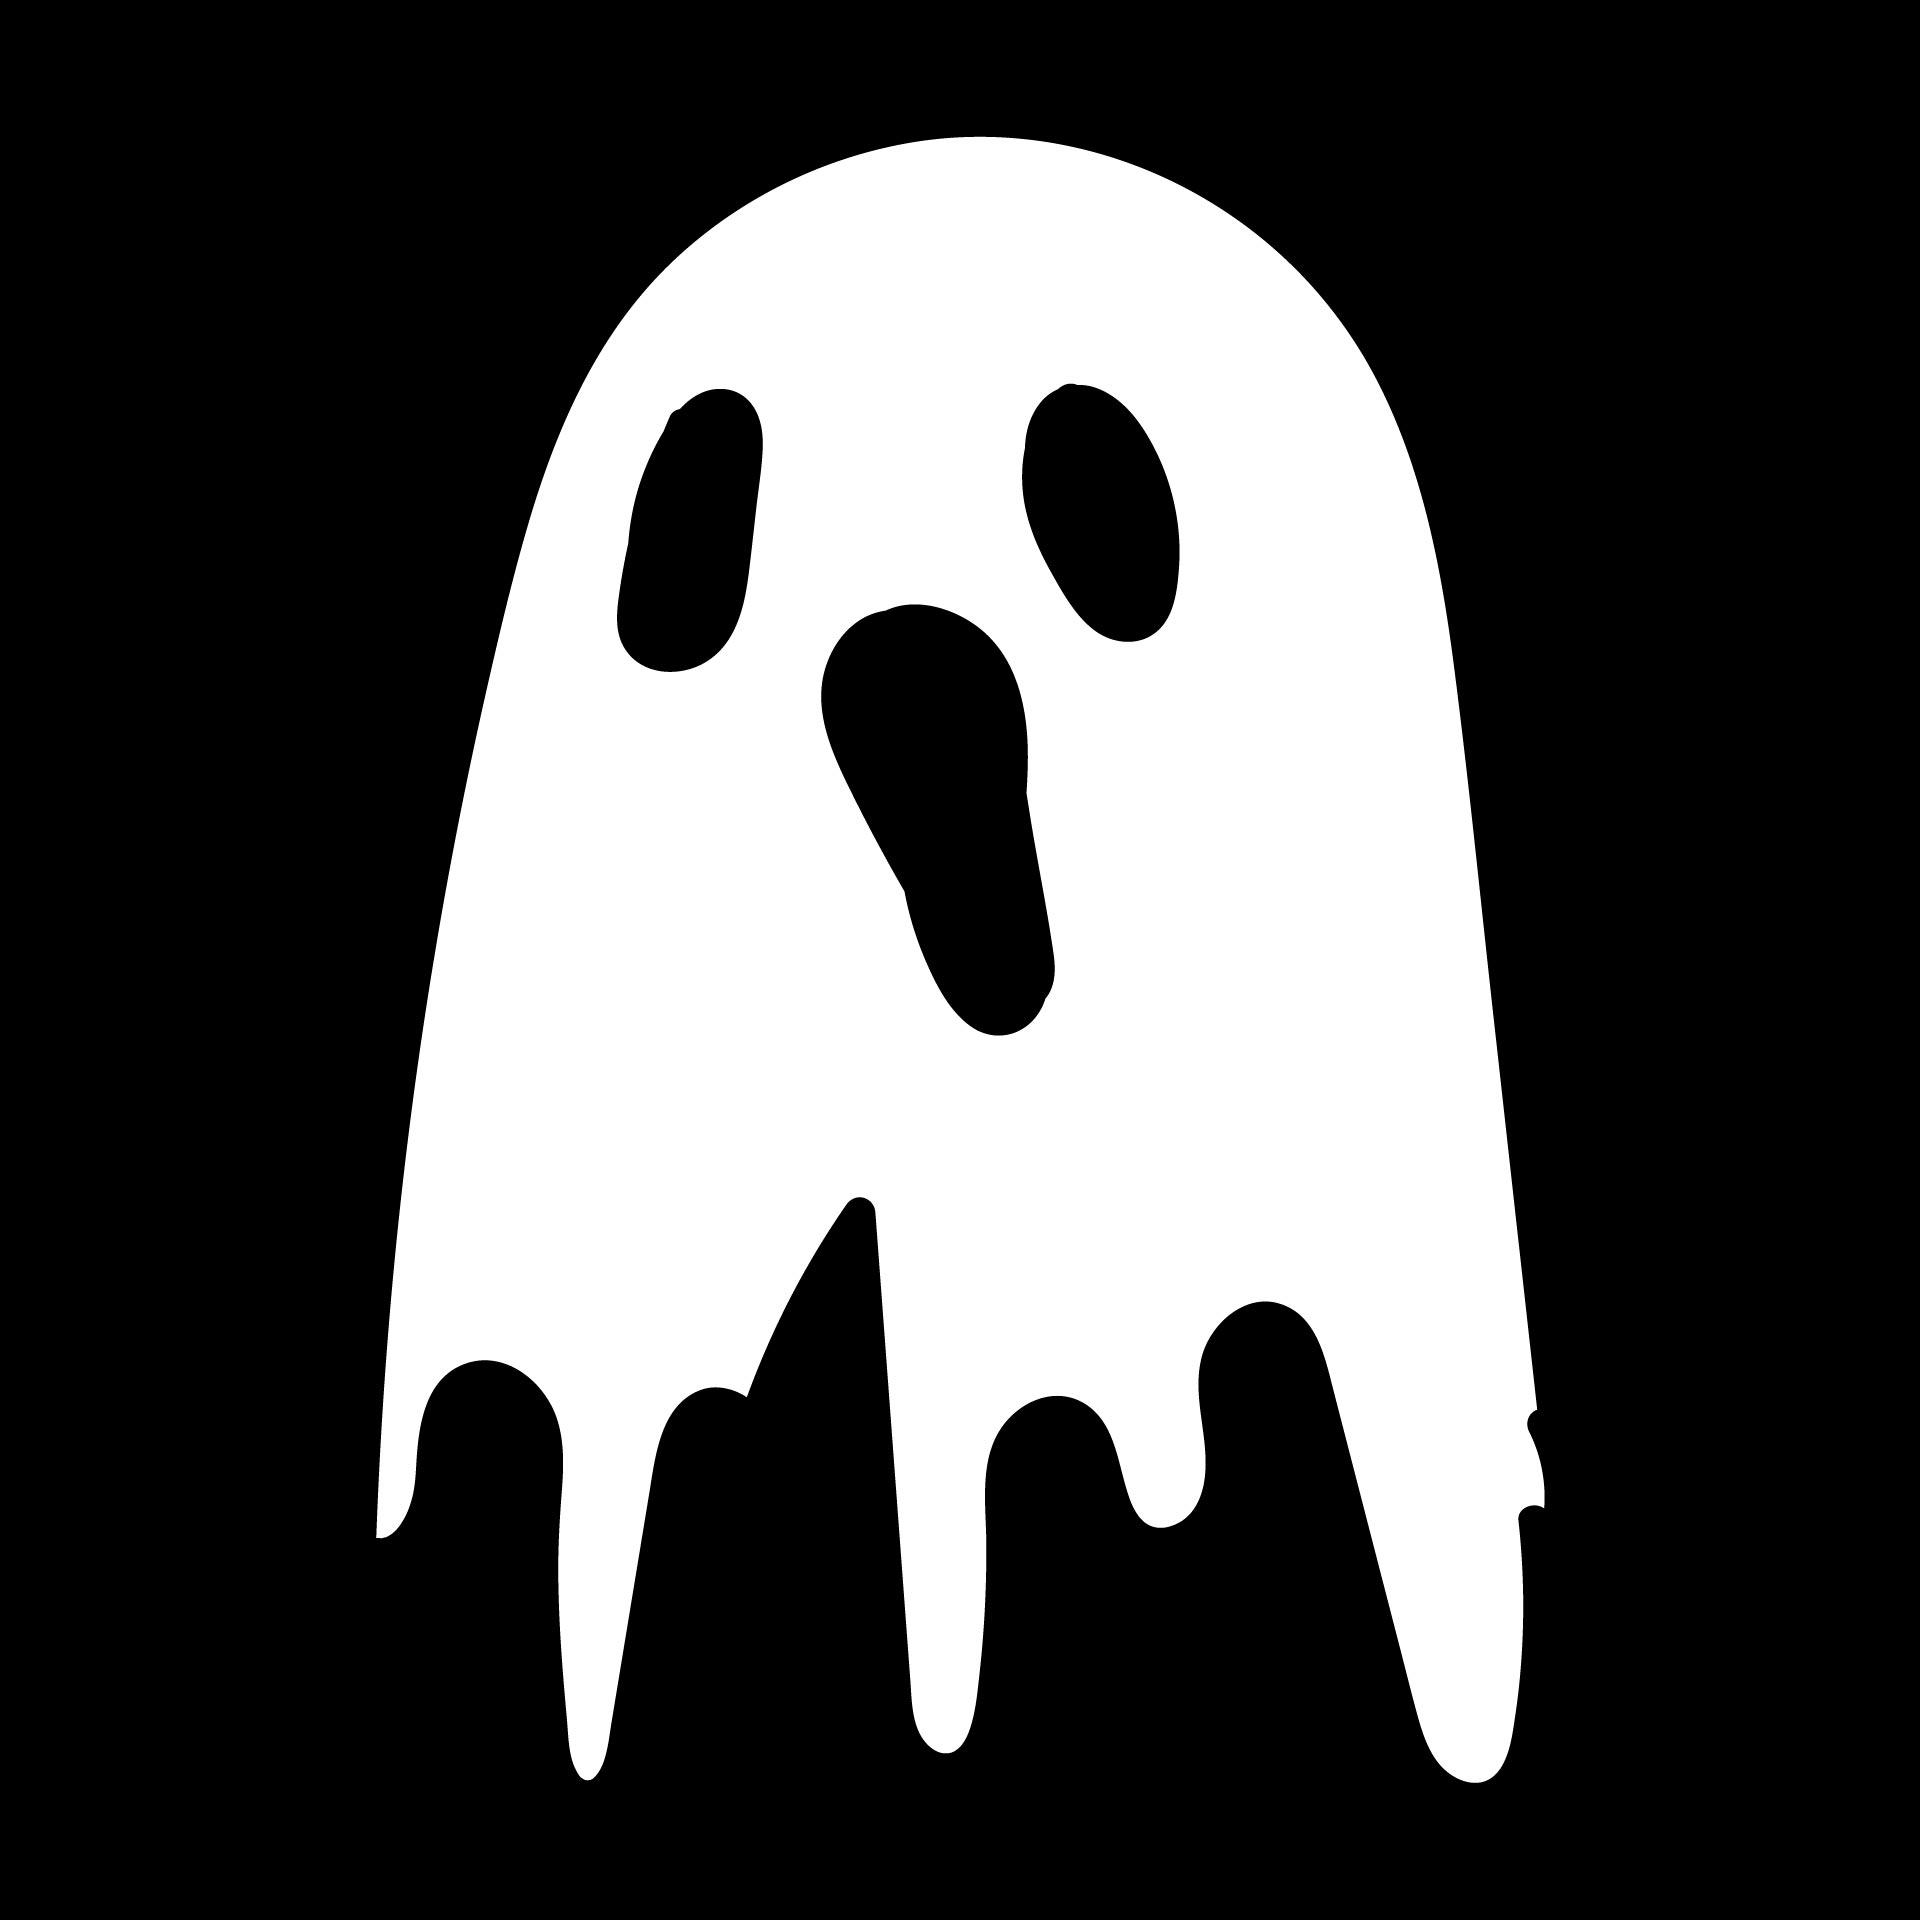 Ghost Halloween Pumpkin Stencils Printable